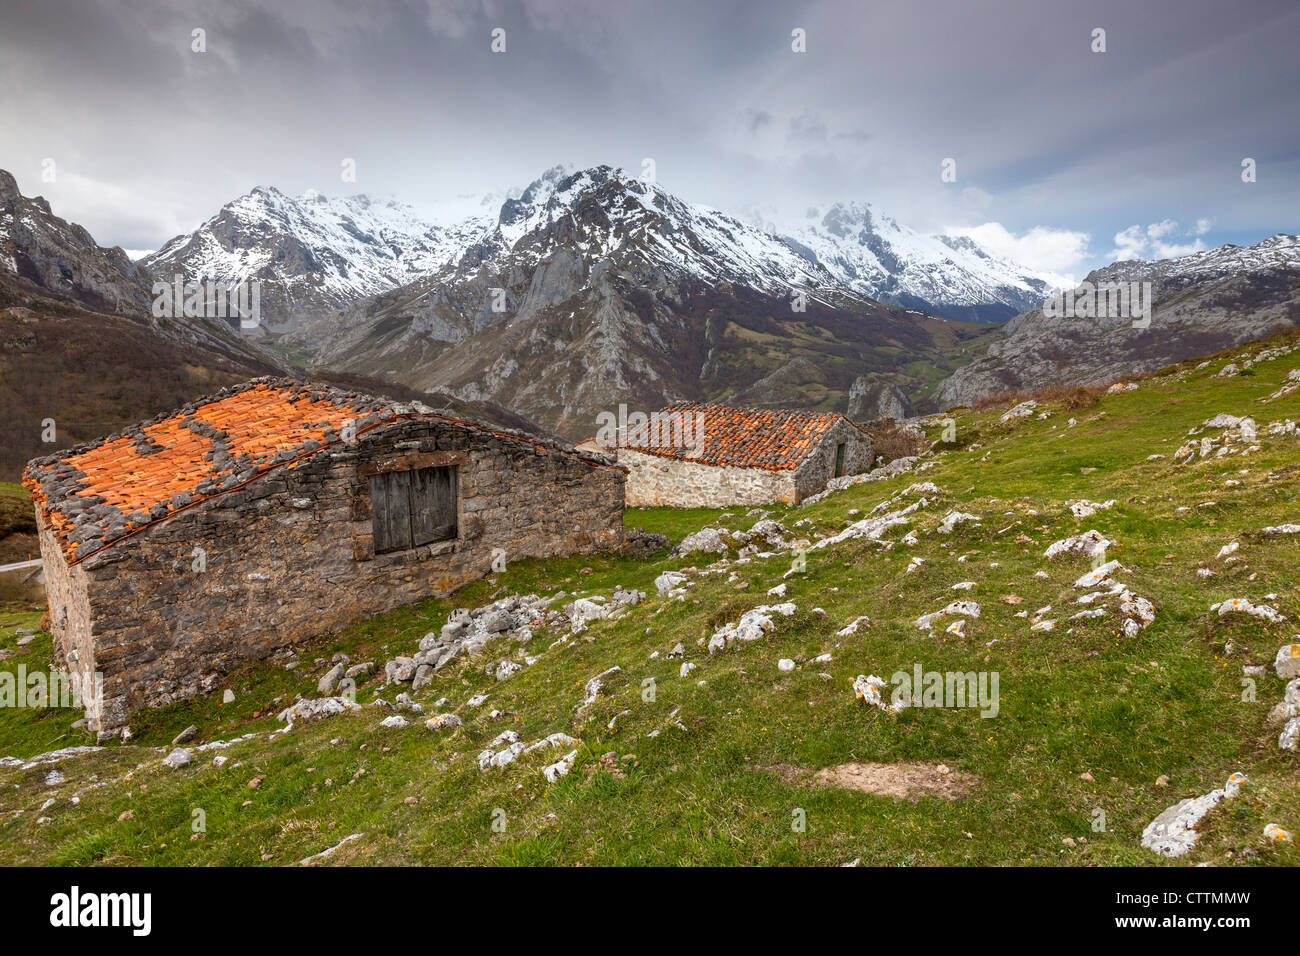 Invernales de La Caballa plus Sotres, Picos de Europa, l'asturien municipalité de Cabrales, Espagne Photo Stock